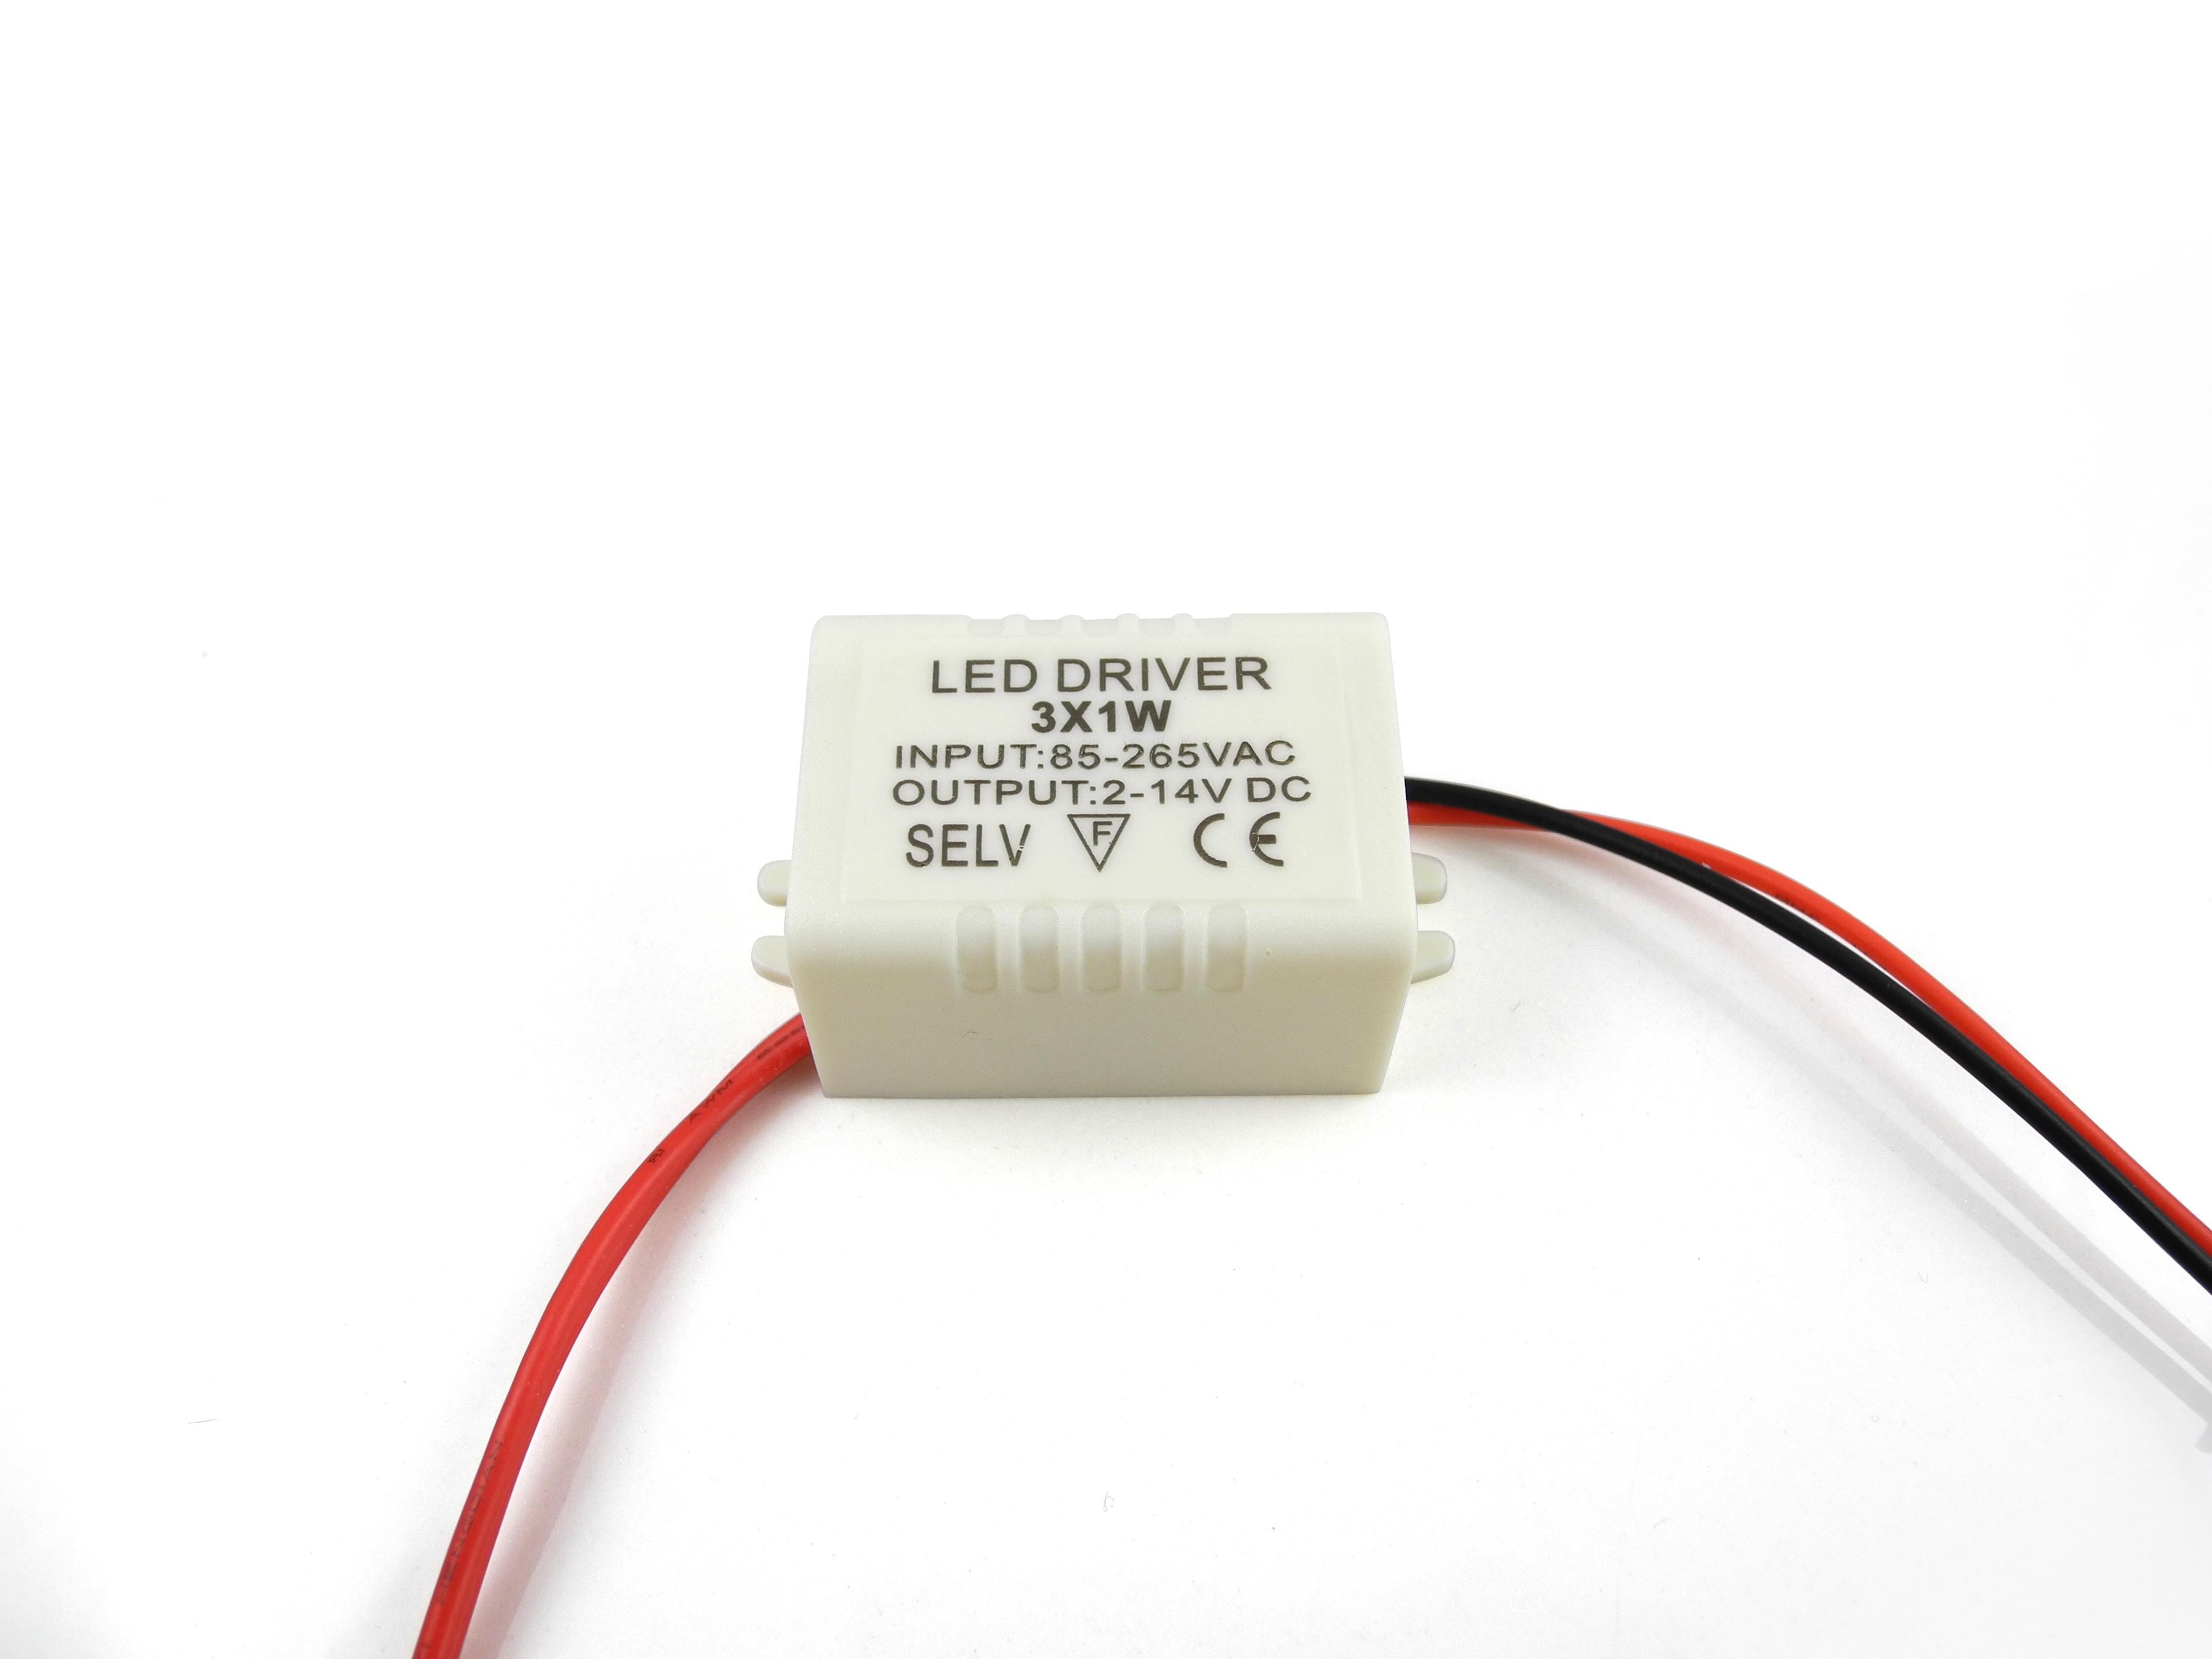 3 X 1w Led Driver Power Supply Transformer Ac 85 265v Dc 2 14v Light Circuit Lights Photography Accessories